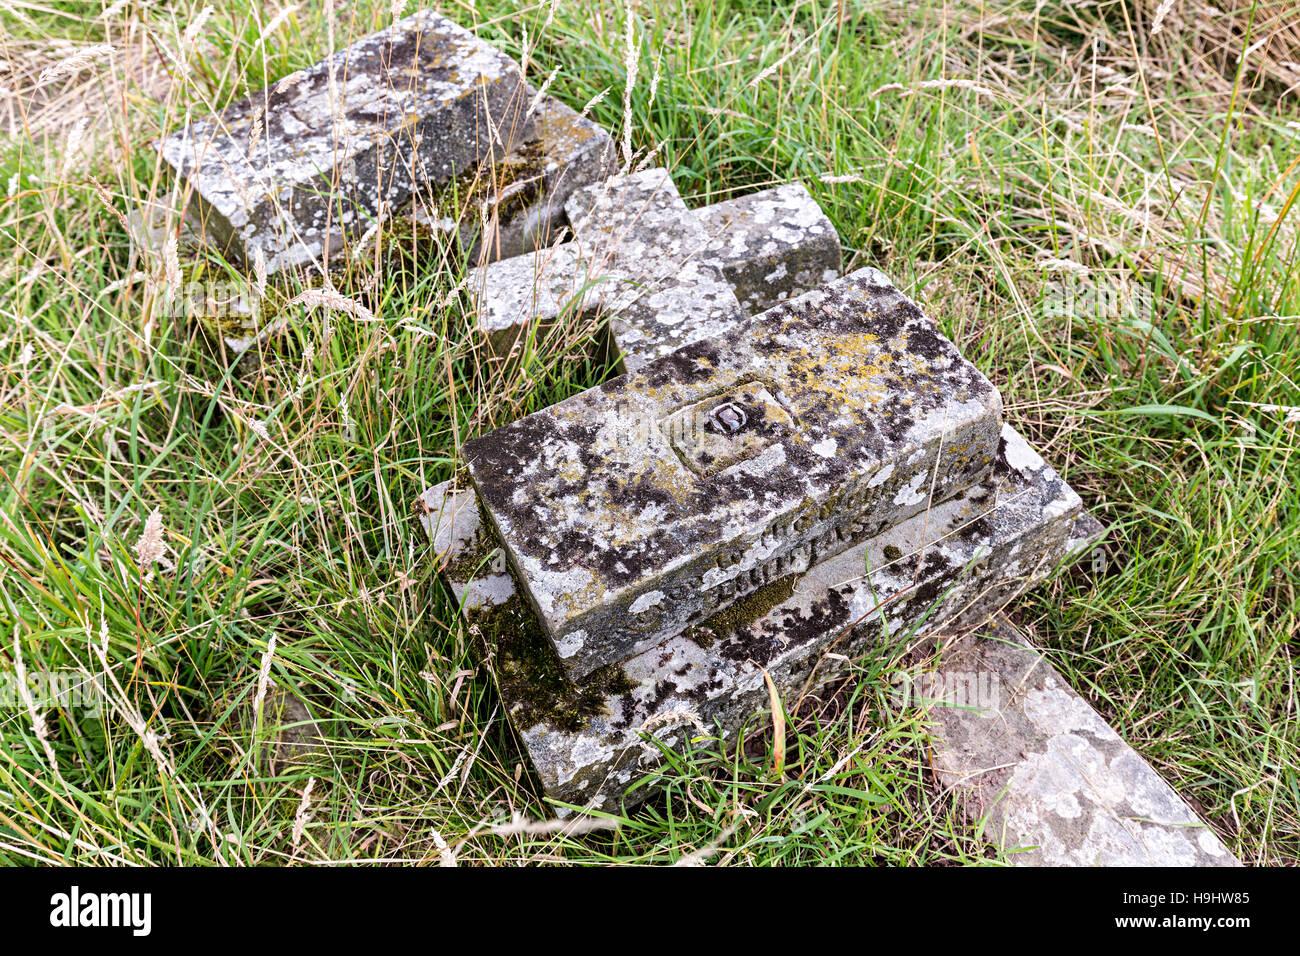 Fallen gravestone, Edvin Loach Old Church churchyard, Herefordshire, England, UK - Stock Image